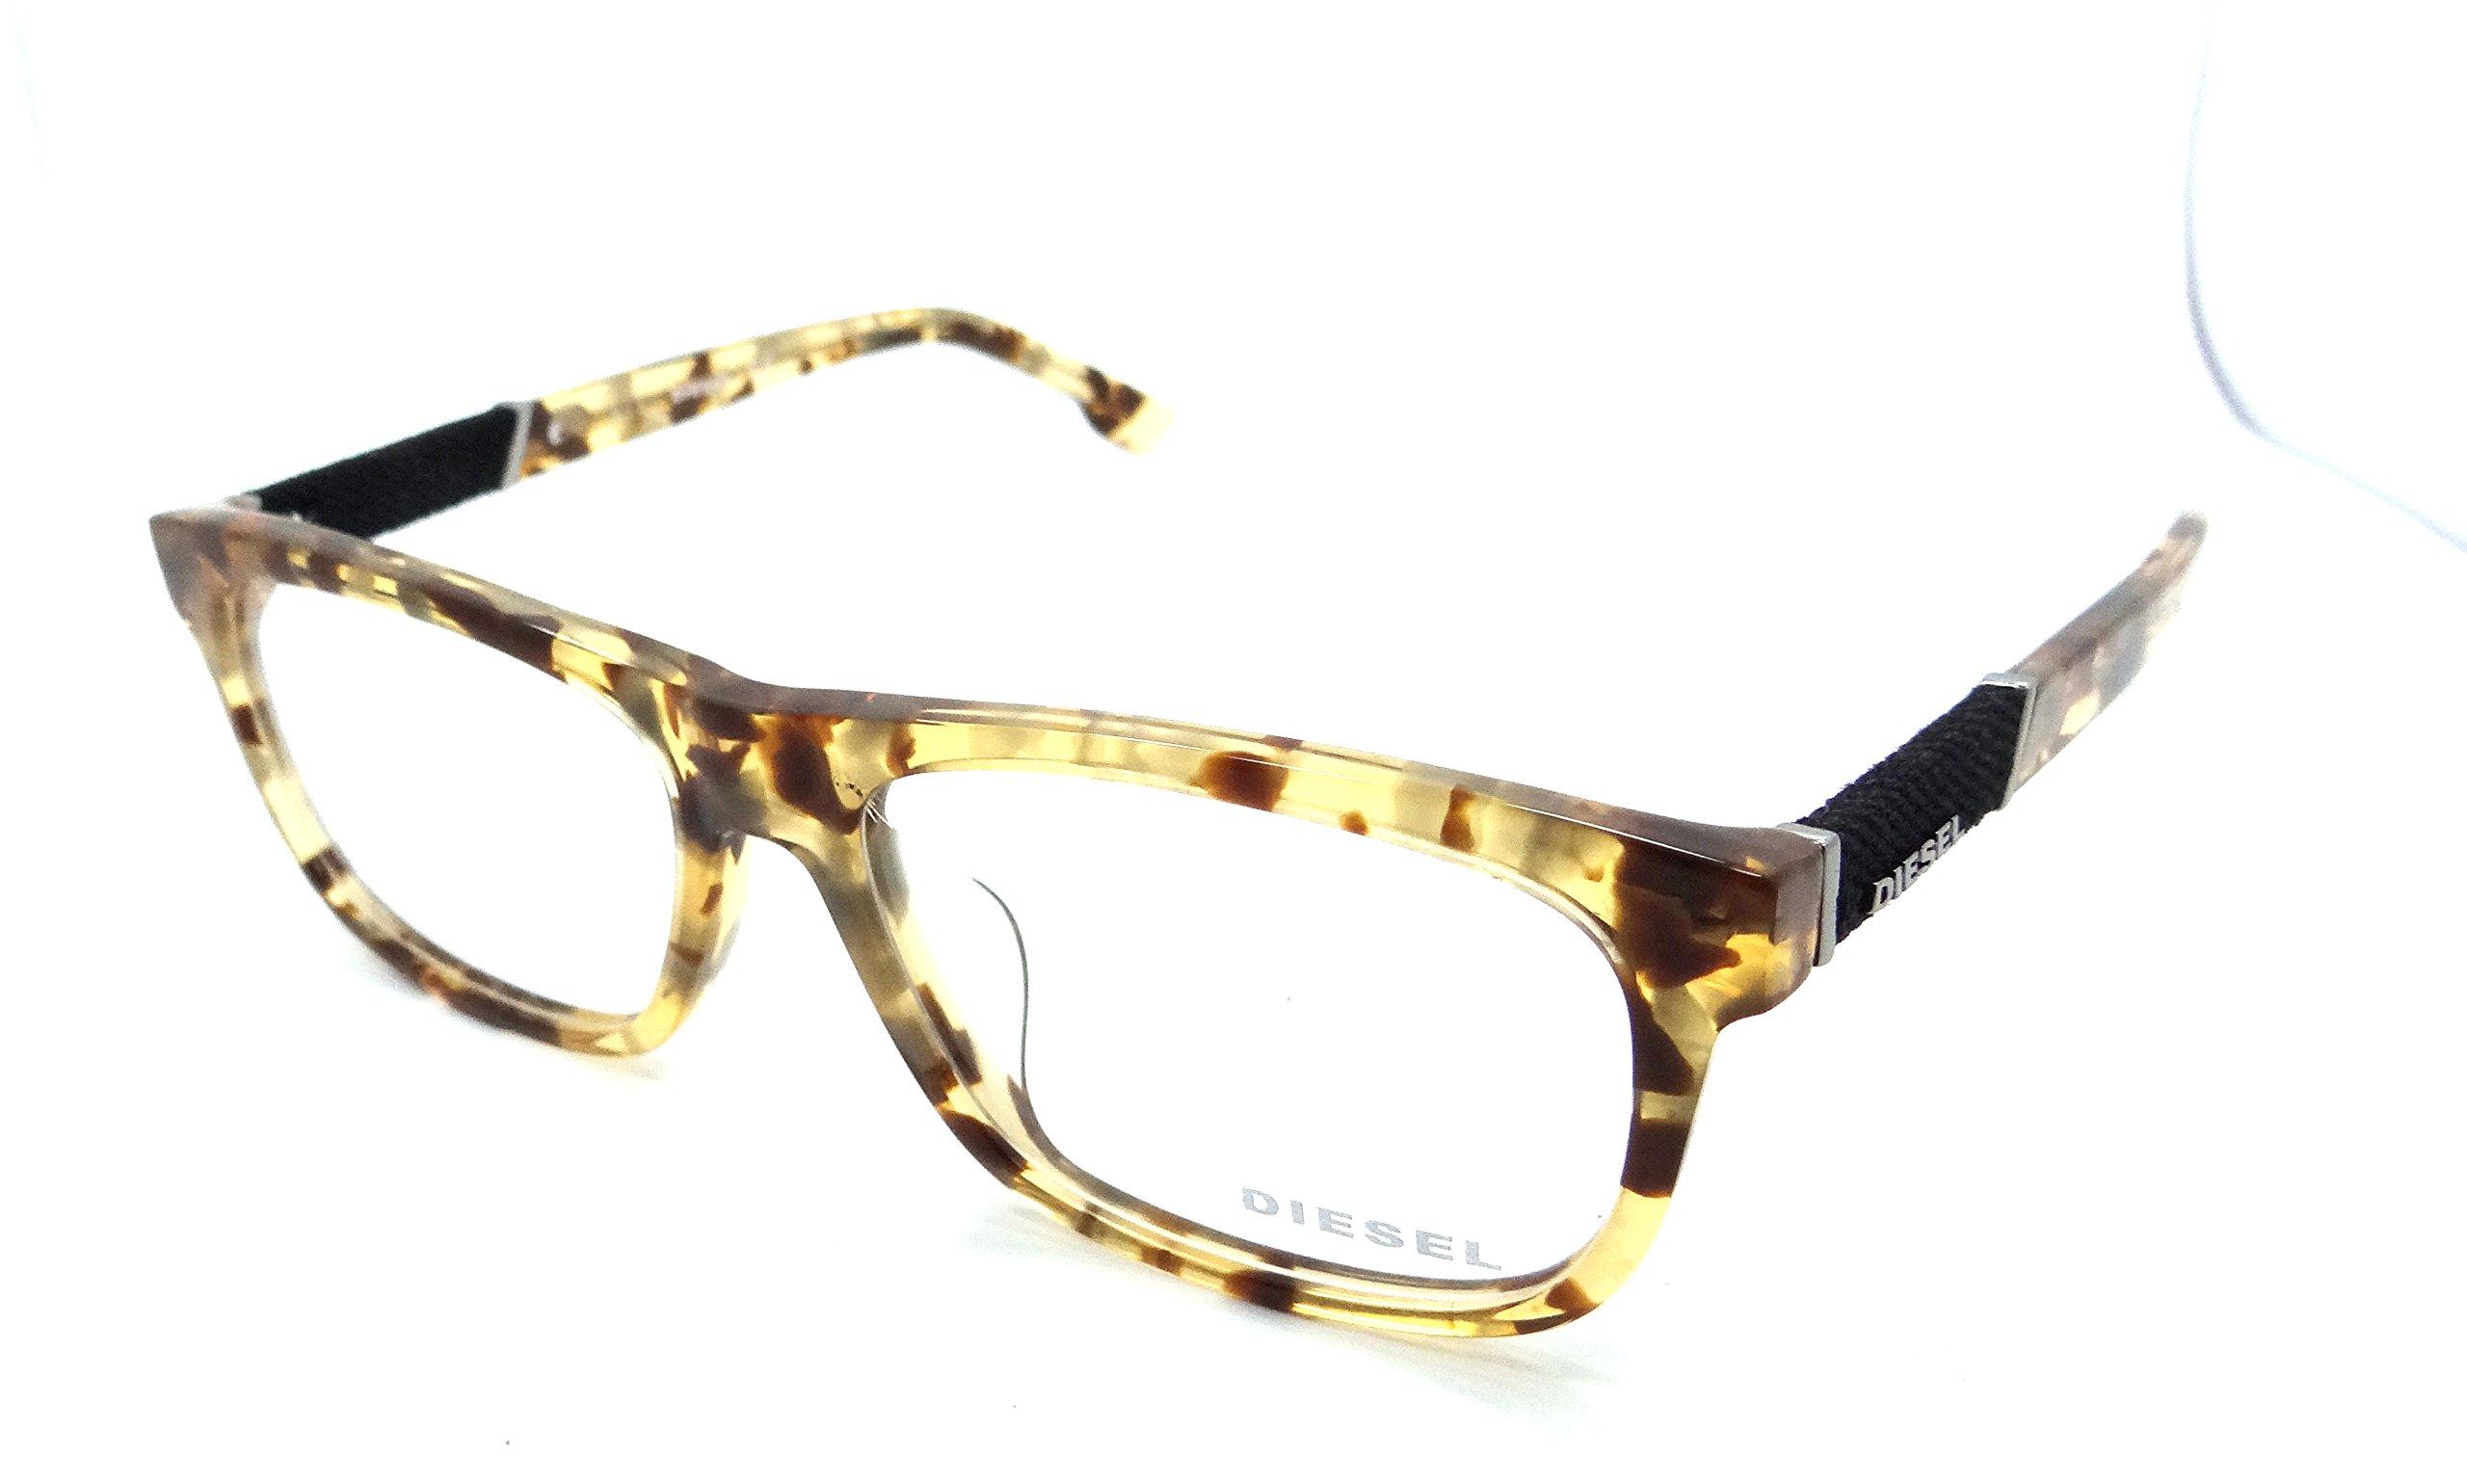 Diesel Rx Eyeglasses Frames DL5107-F 053 57-16-150 Blonde Havana Asian Fit